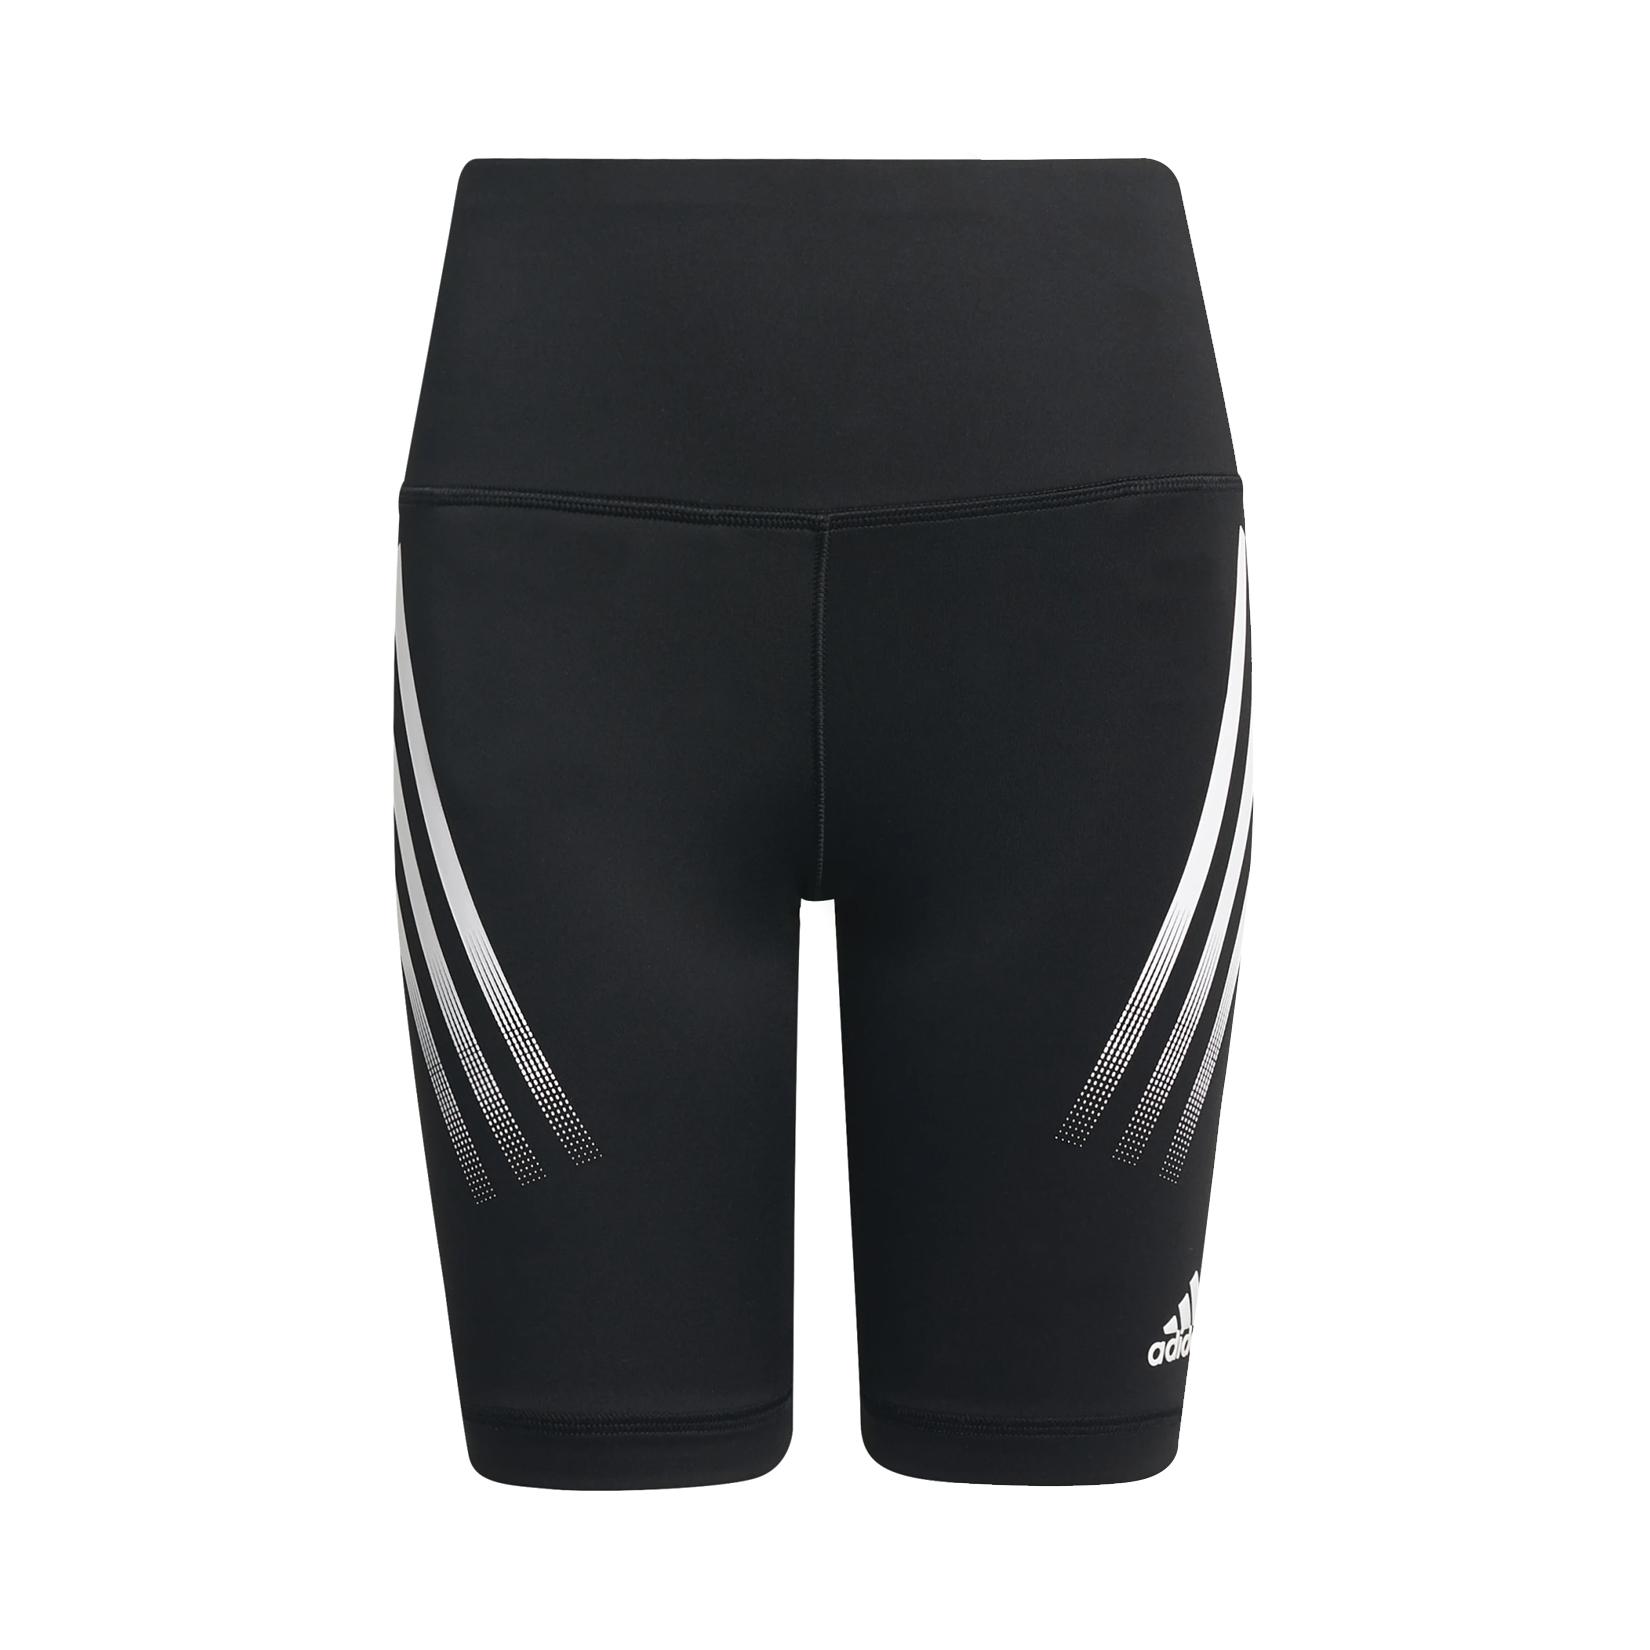 Adidas Believe This Aeroready 3-Stripes High-Rise Black